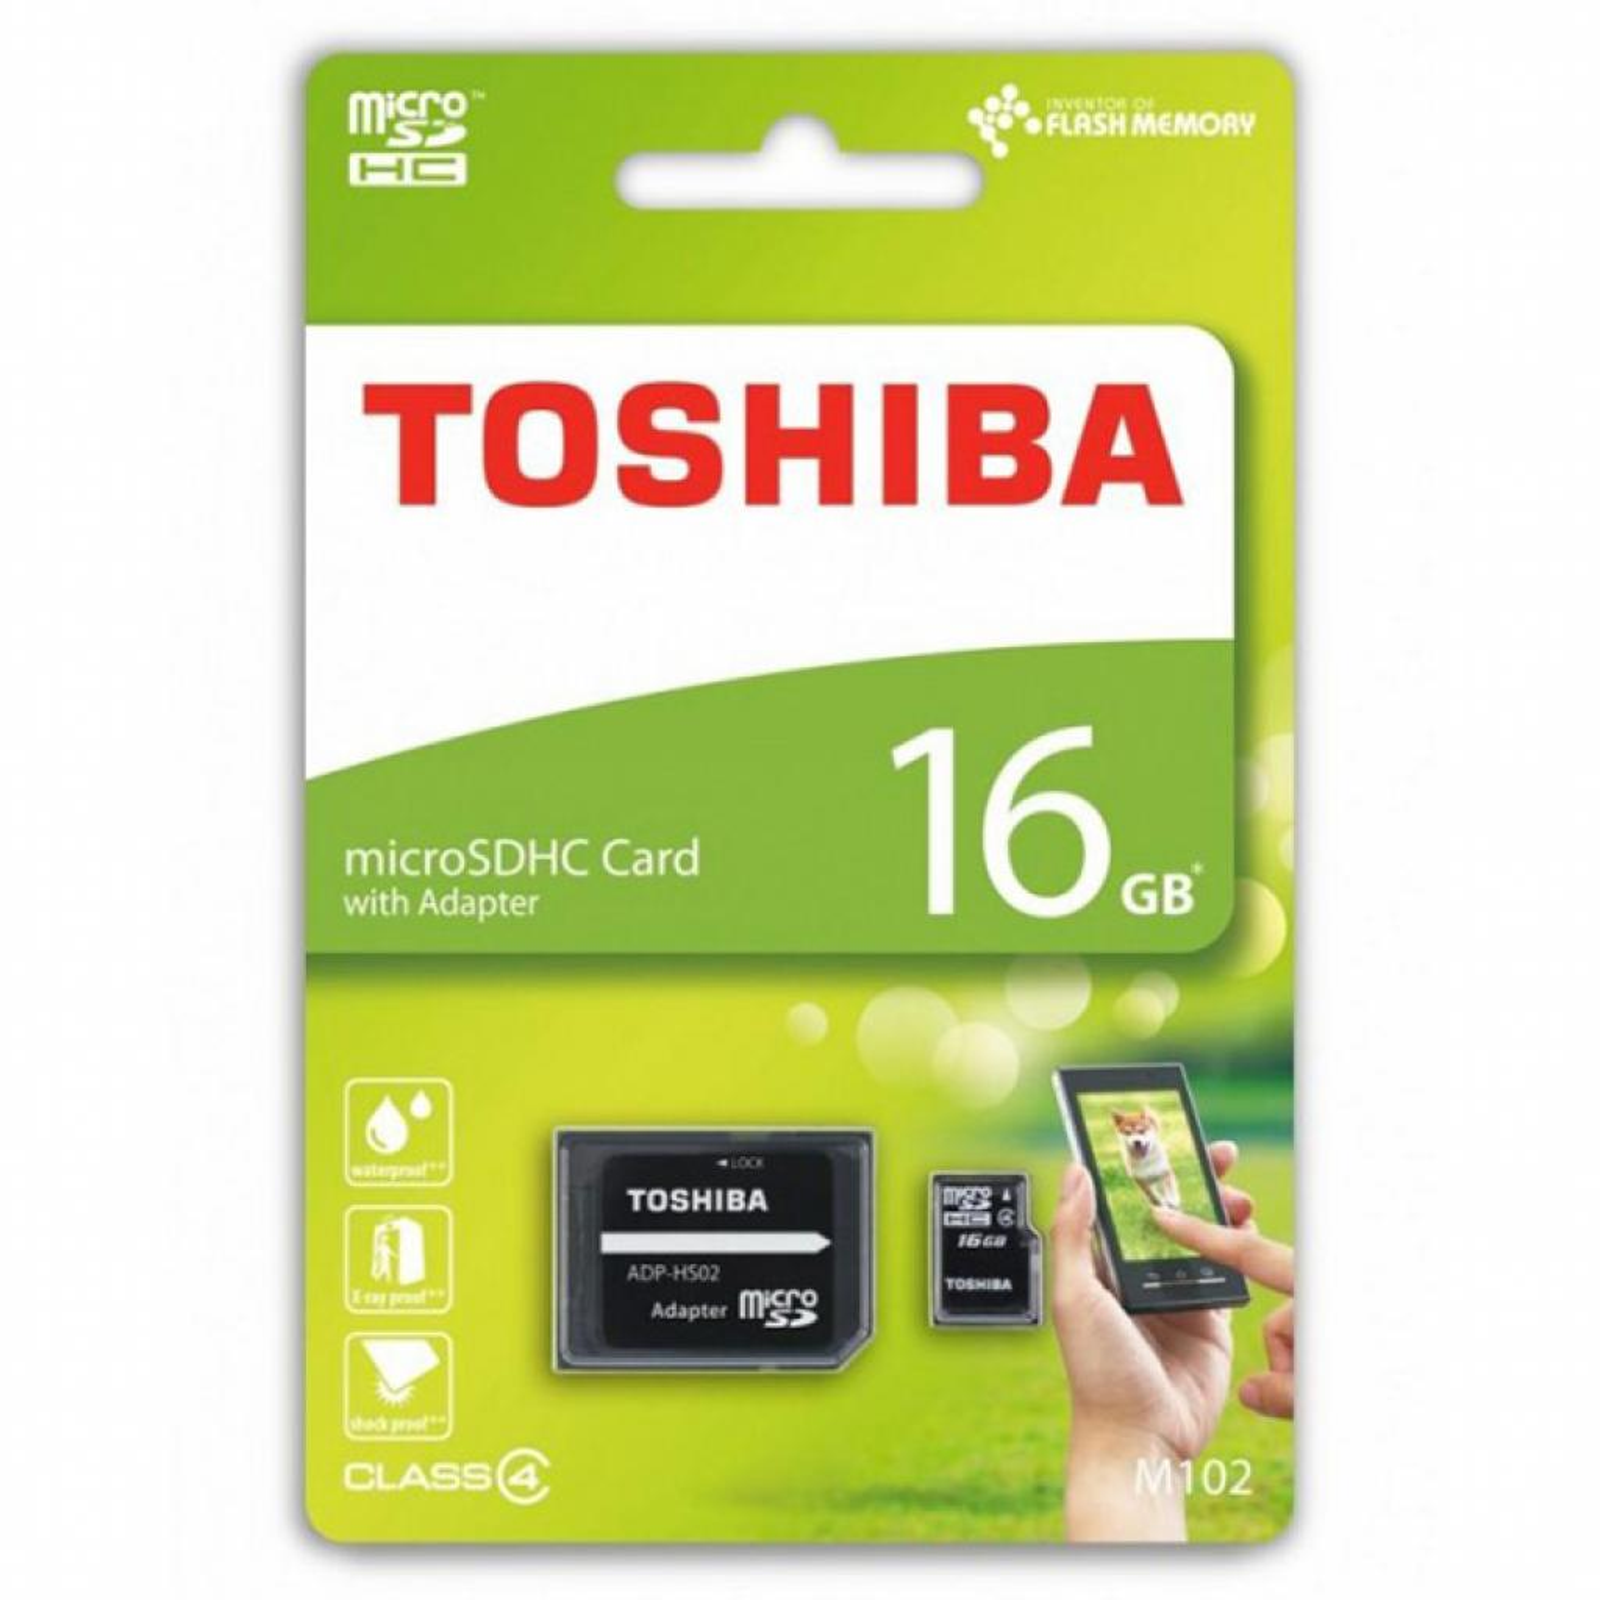 Карта памяти TOSHIBA 16GB microSDHC Class 4 (THN-M102K0160M2) изображение 2